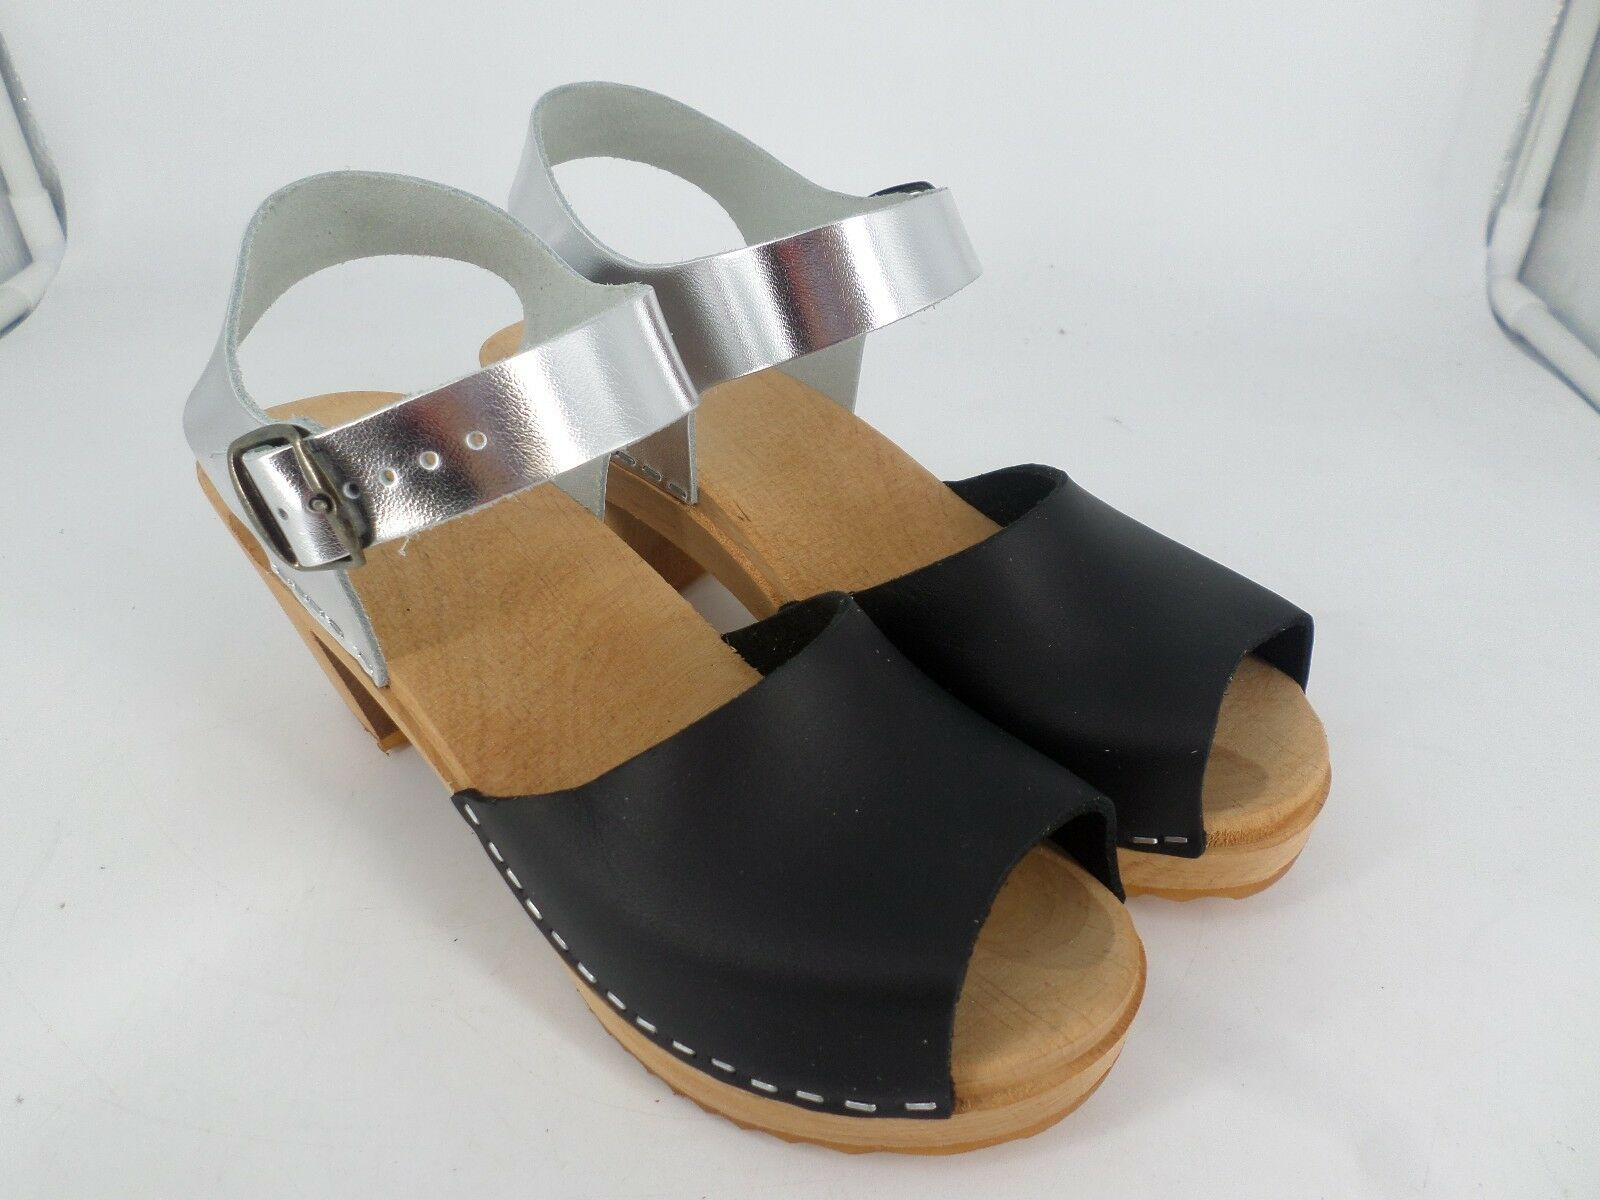 Ladies Leather Peep Toe Clog Sandals UK 8 EU 42 LN26 18 SALEs